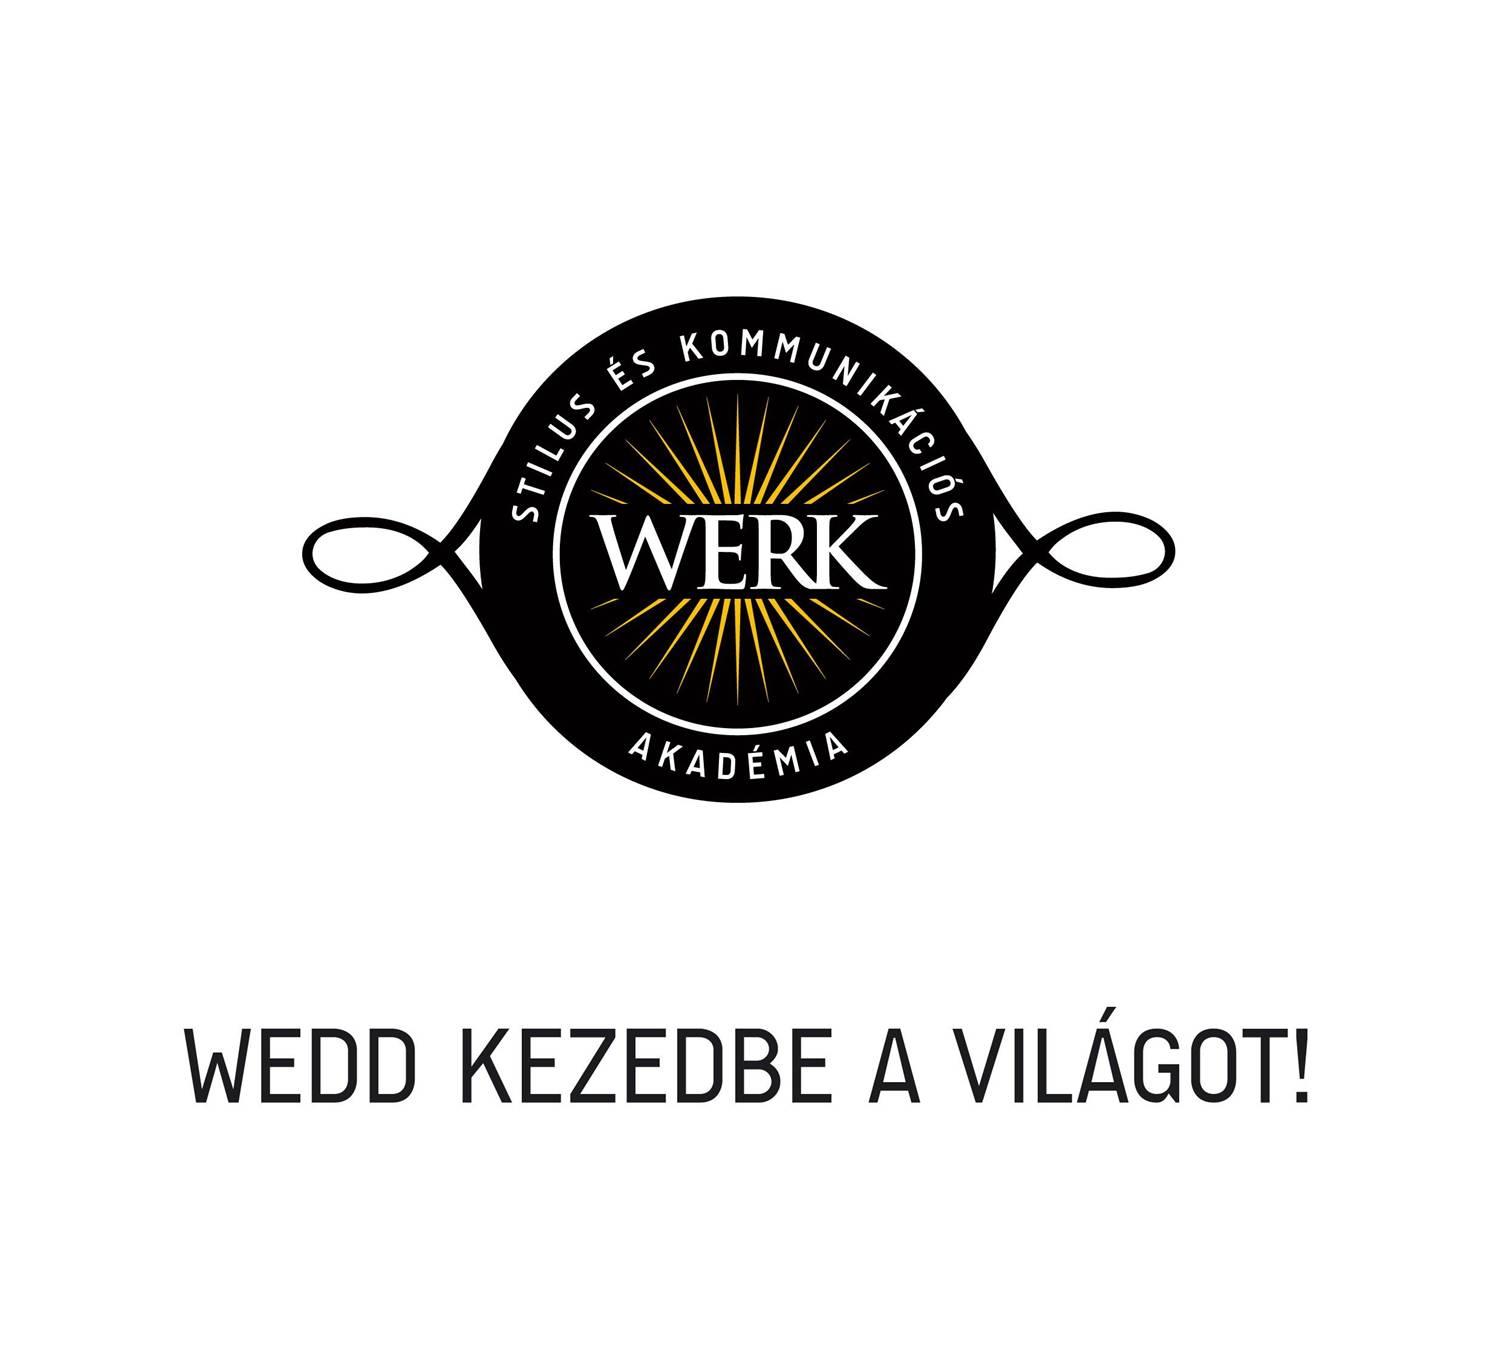 werk_logo.jpg